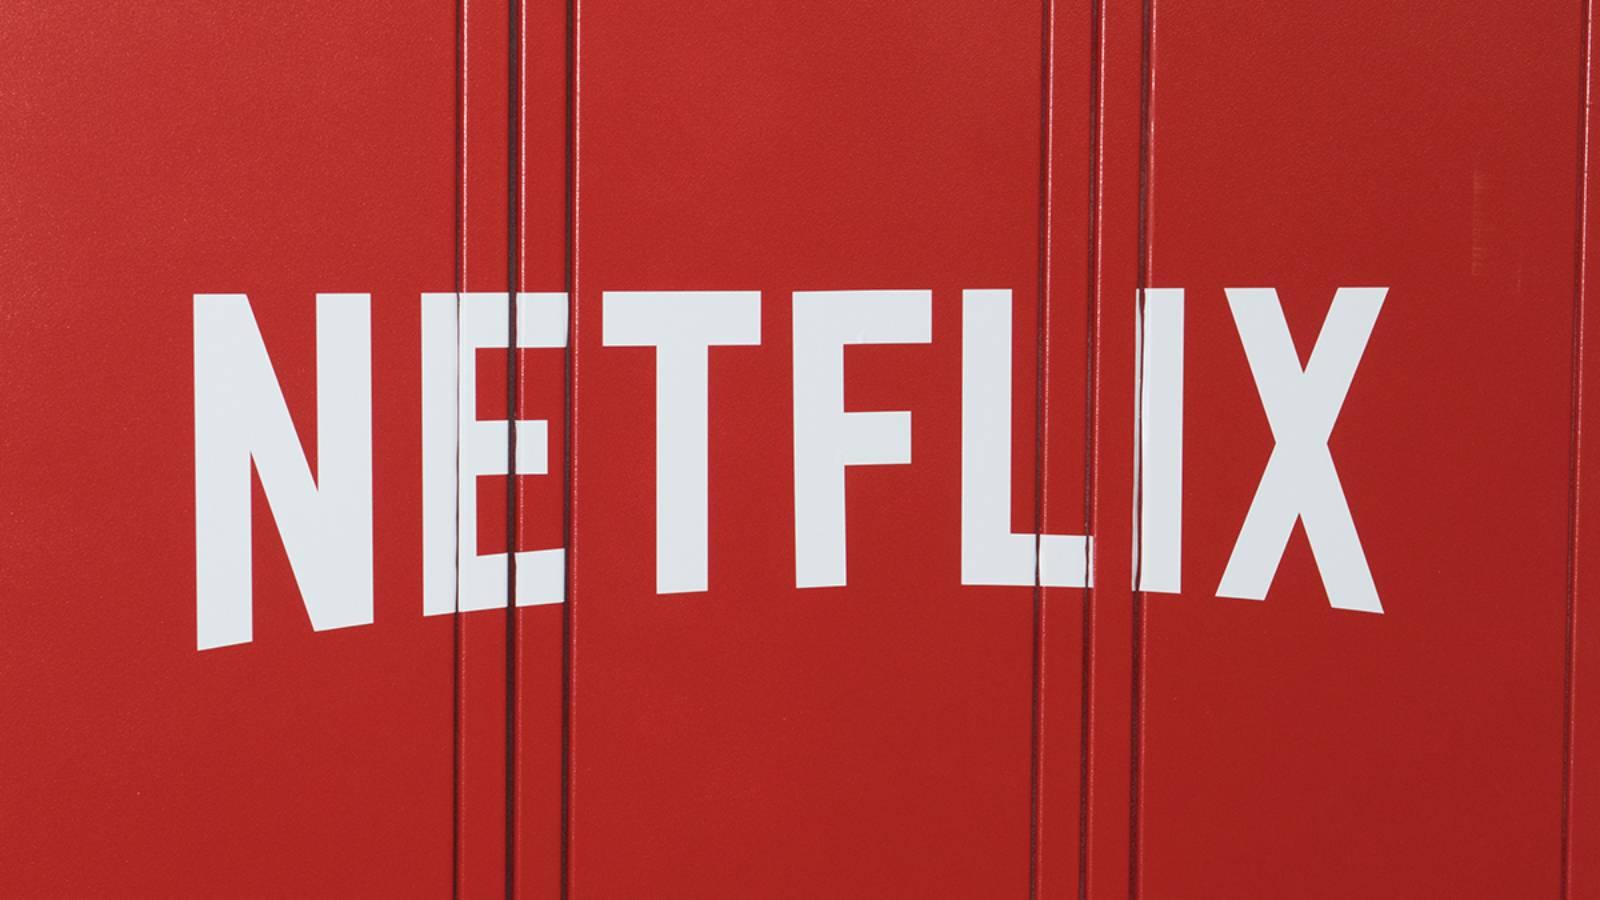 Netflix clienti